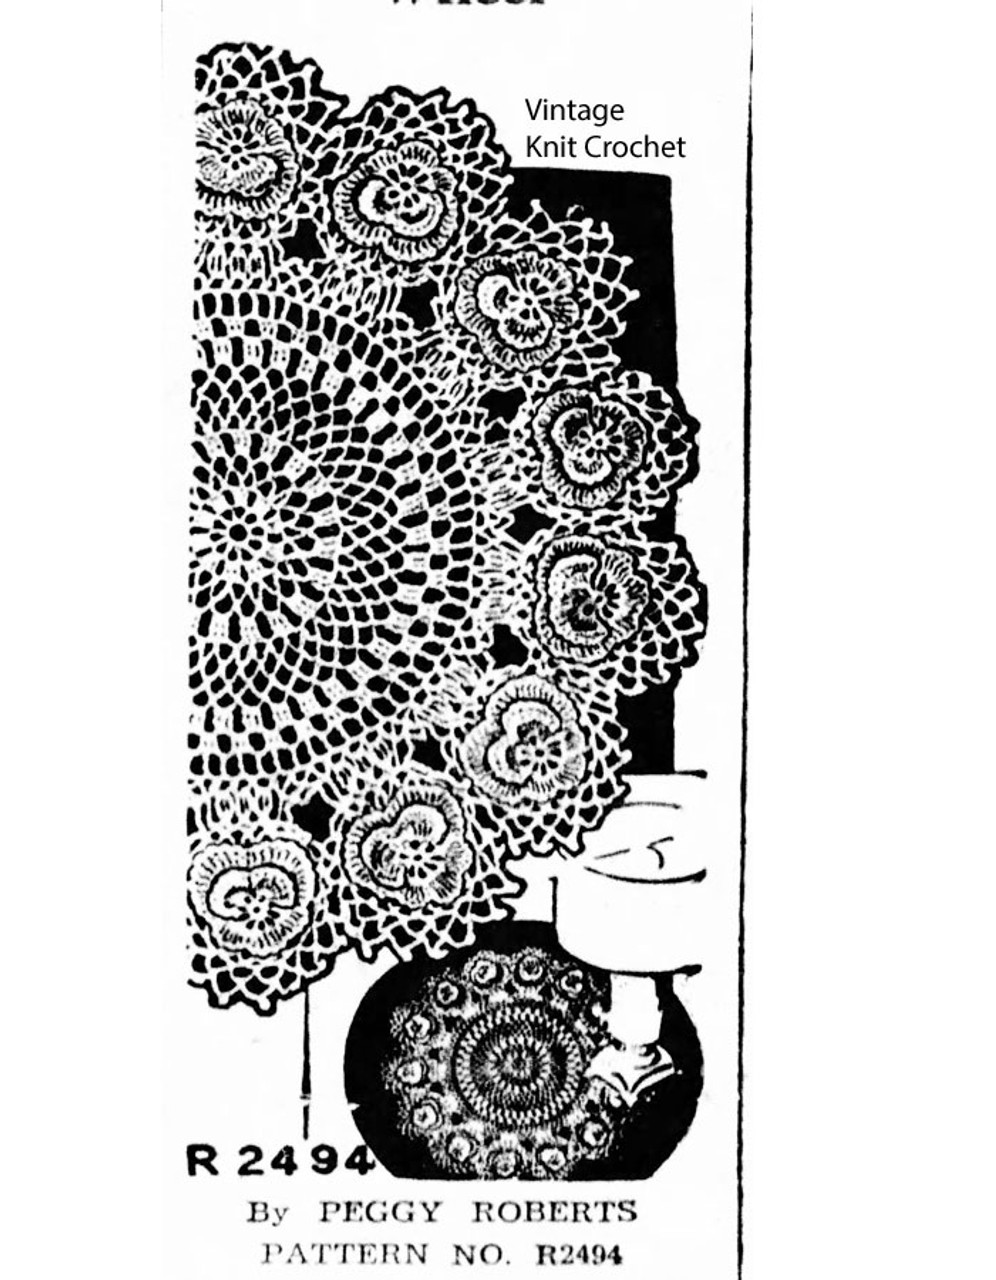 Crochet pansy doily pattern, Peggy Roberts R2494